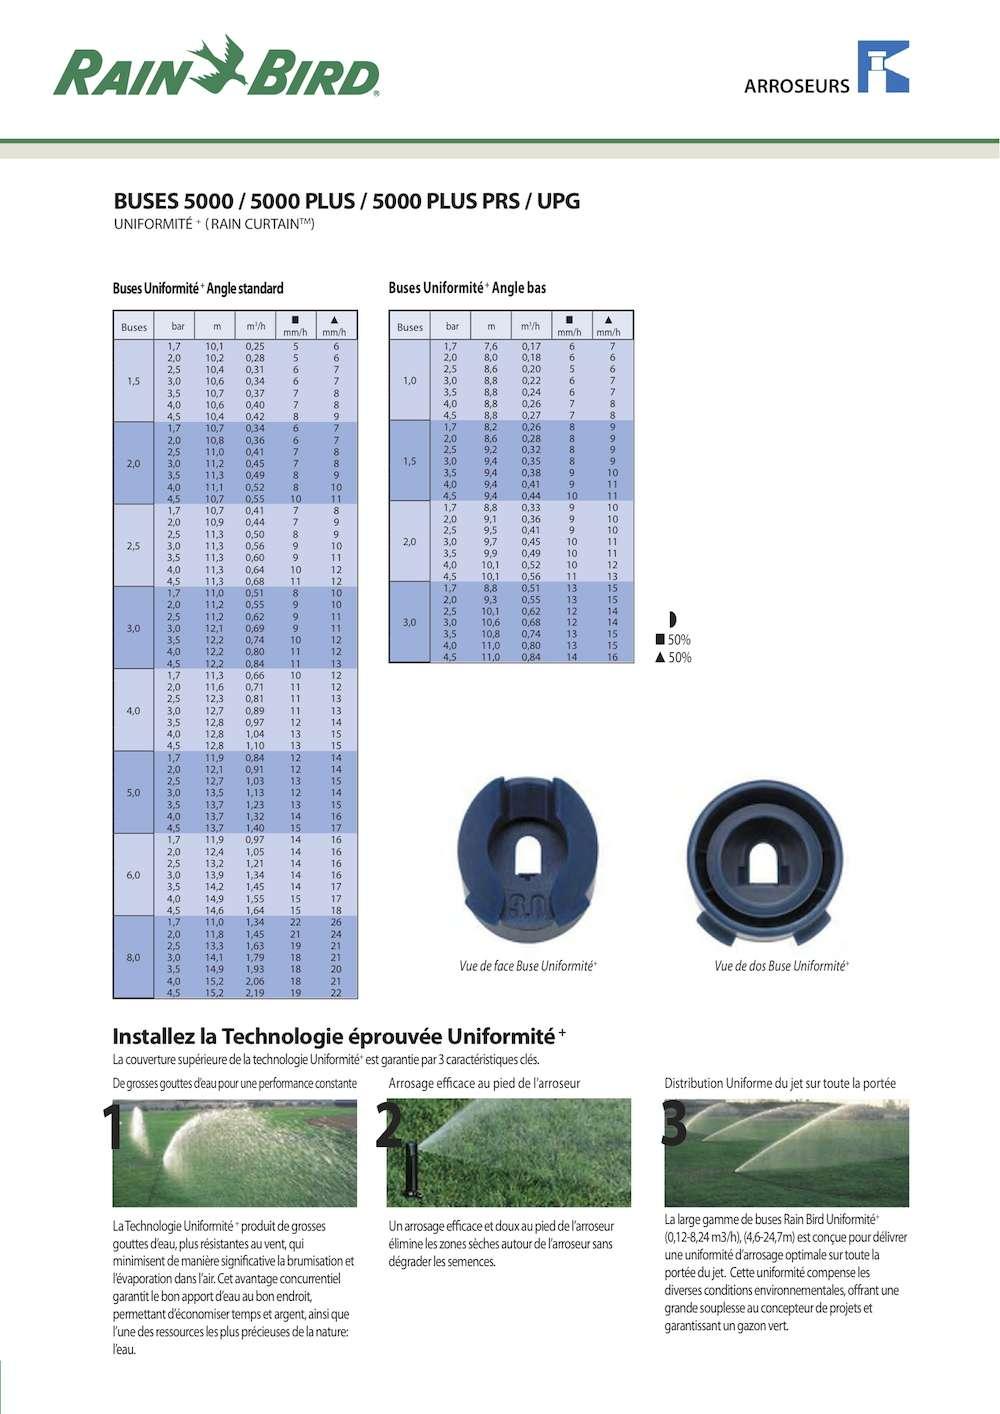 arroseur turbine 5004 pc rainbird arrosage lotx3 pro 608rb5004pm ebay. Black Bedroom Furniture Sets. Home Design Ideas